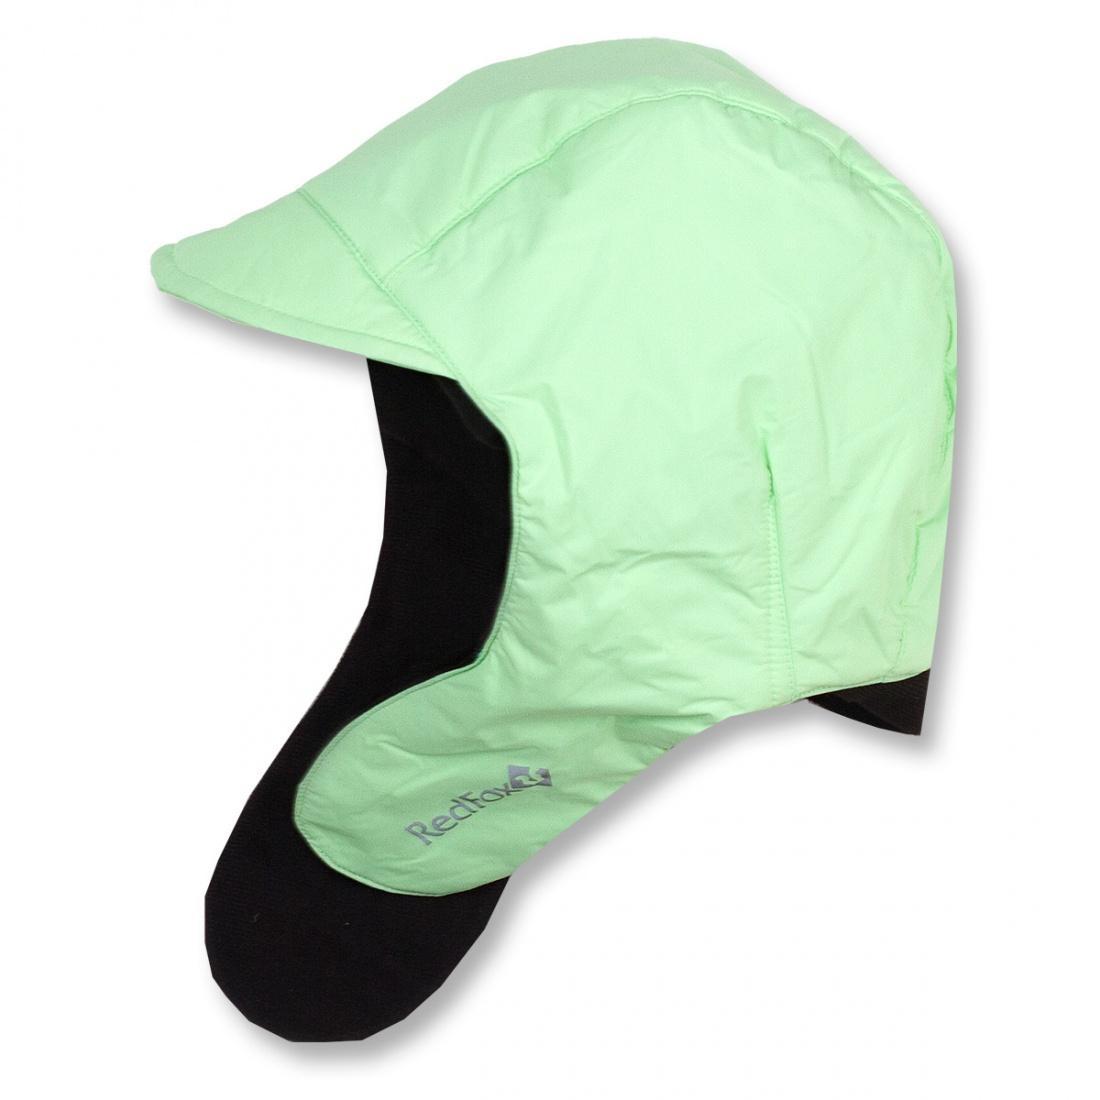 Шапка детская PilotУшанки<br><br> Удобная стильная шапочка для детей от года. <br><br> <br><br><br><br> Материал – Dry Factor 1000.<br><br> <br><br><br> Утеплитель – Omniterm Classic.<br><br> <br><br><br> Облегающий крой.<br><br> <br><br>...<br><br>Цвет: Светло-зеленый<br>Размер: XL